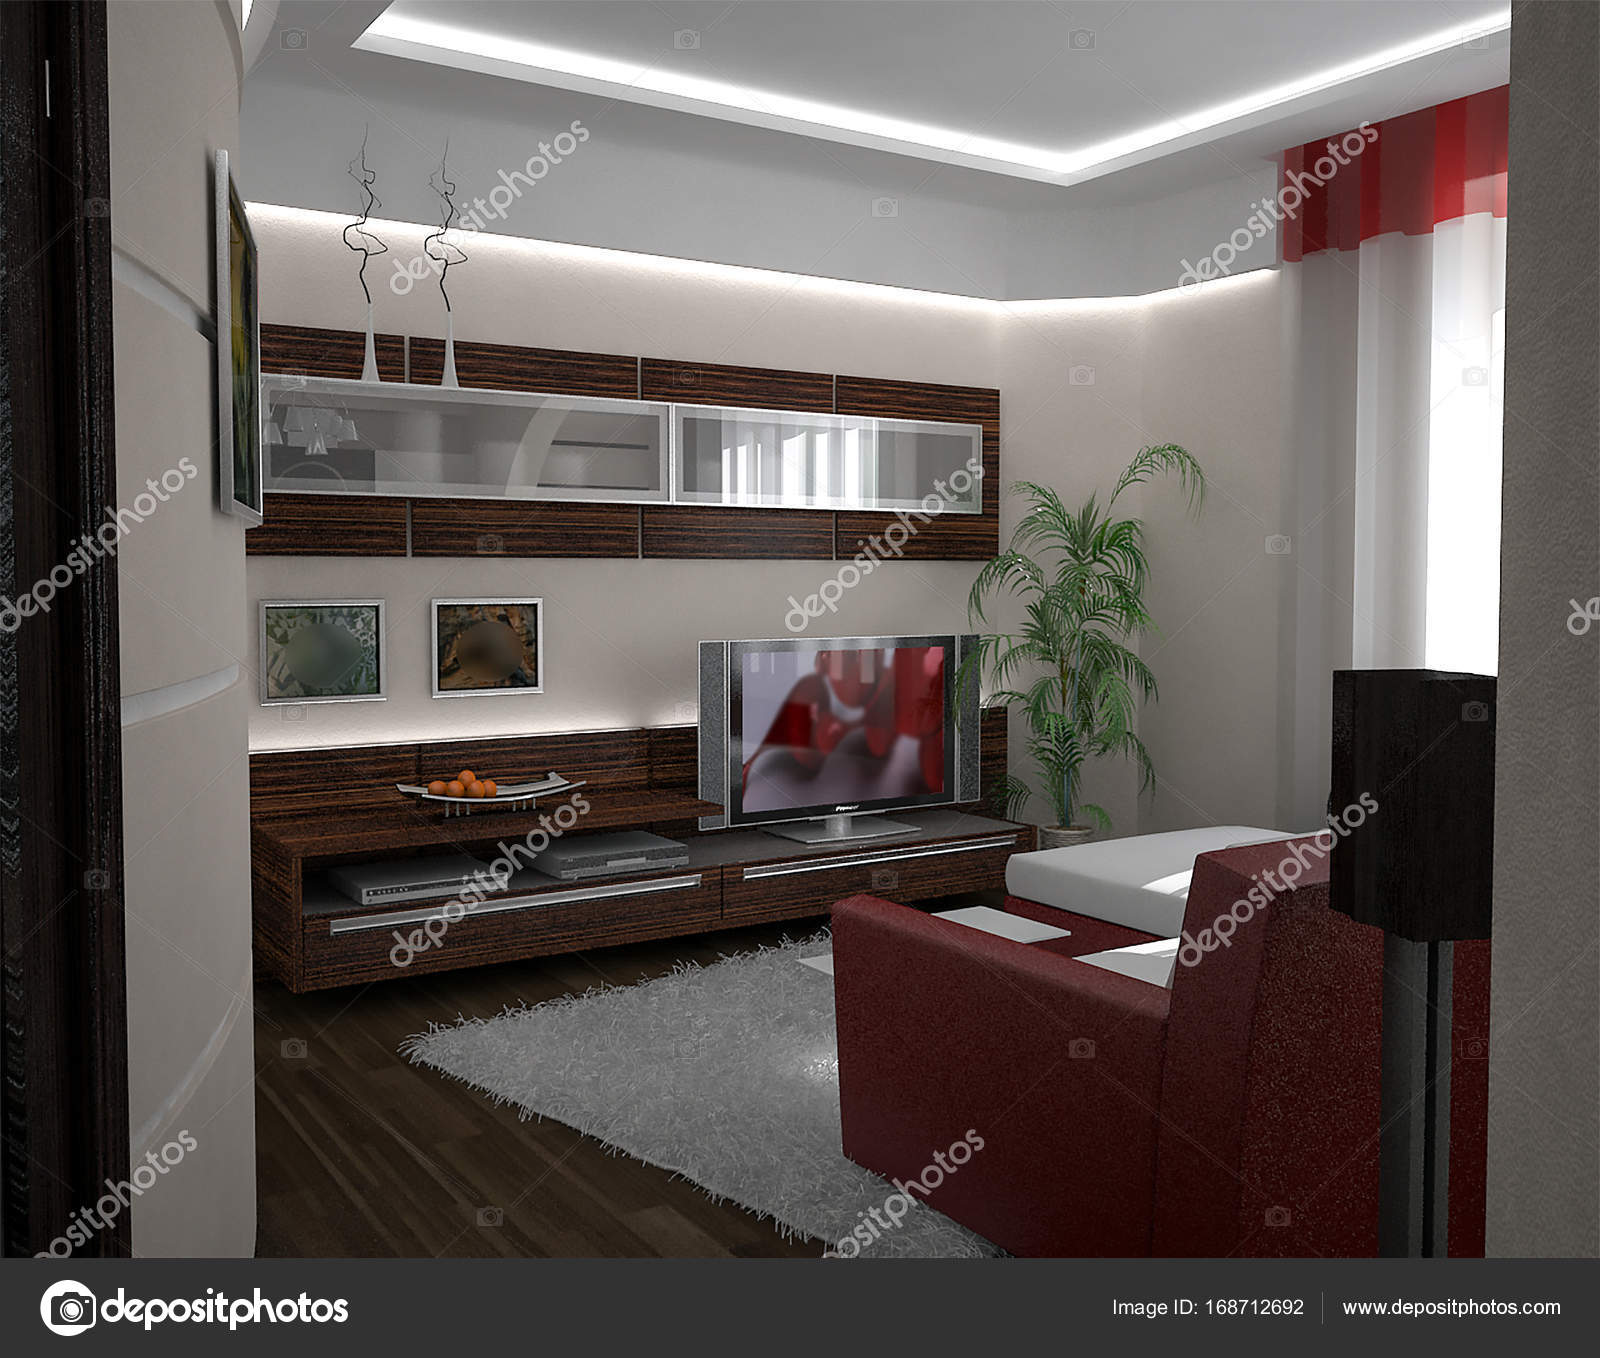 Drawing room interior design ideas 3d render stock photo